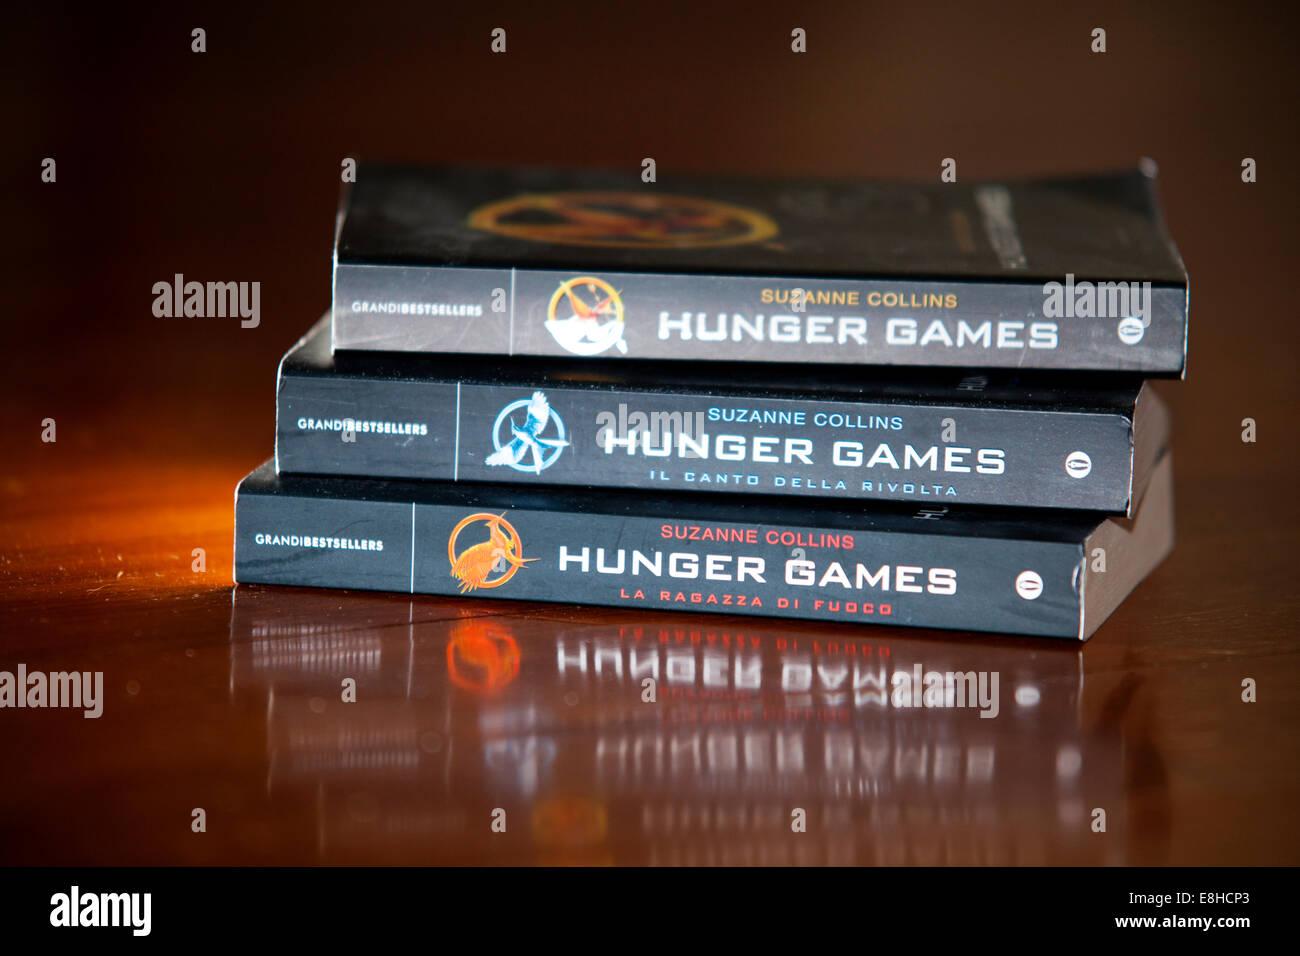 Hunger games trilogy books - best seller - Stock Image